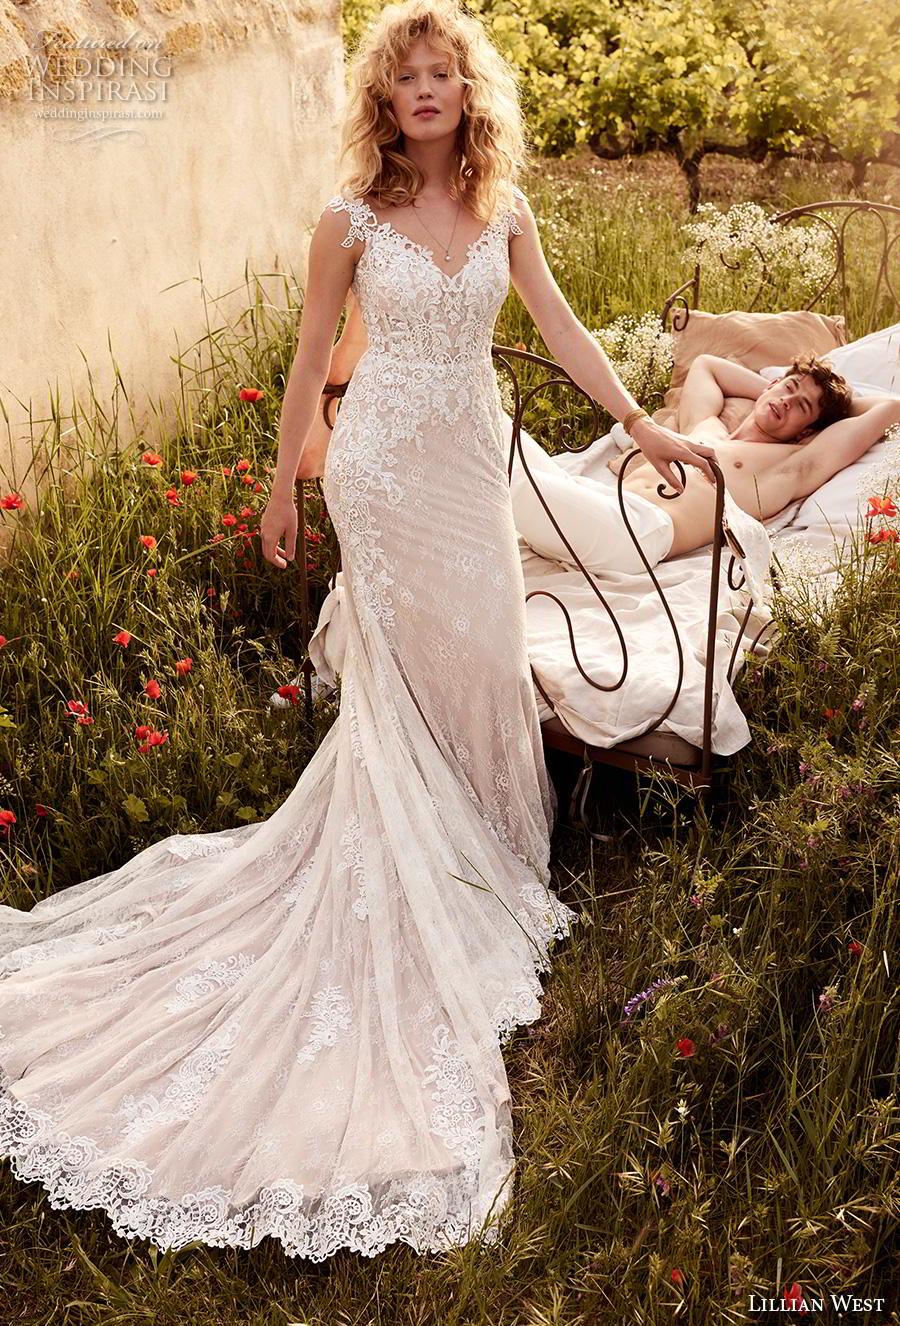 Spring Wedding Dresses.Lillian West Spring 2019 Wedding Dresses Wedding Inspirasi